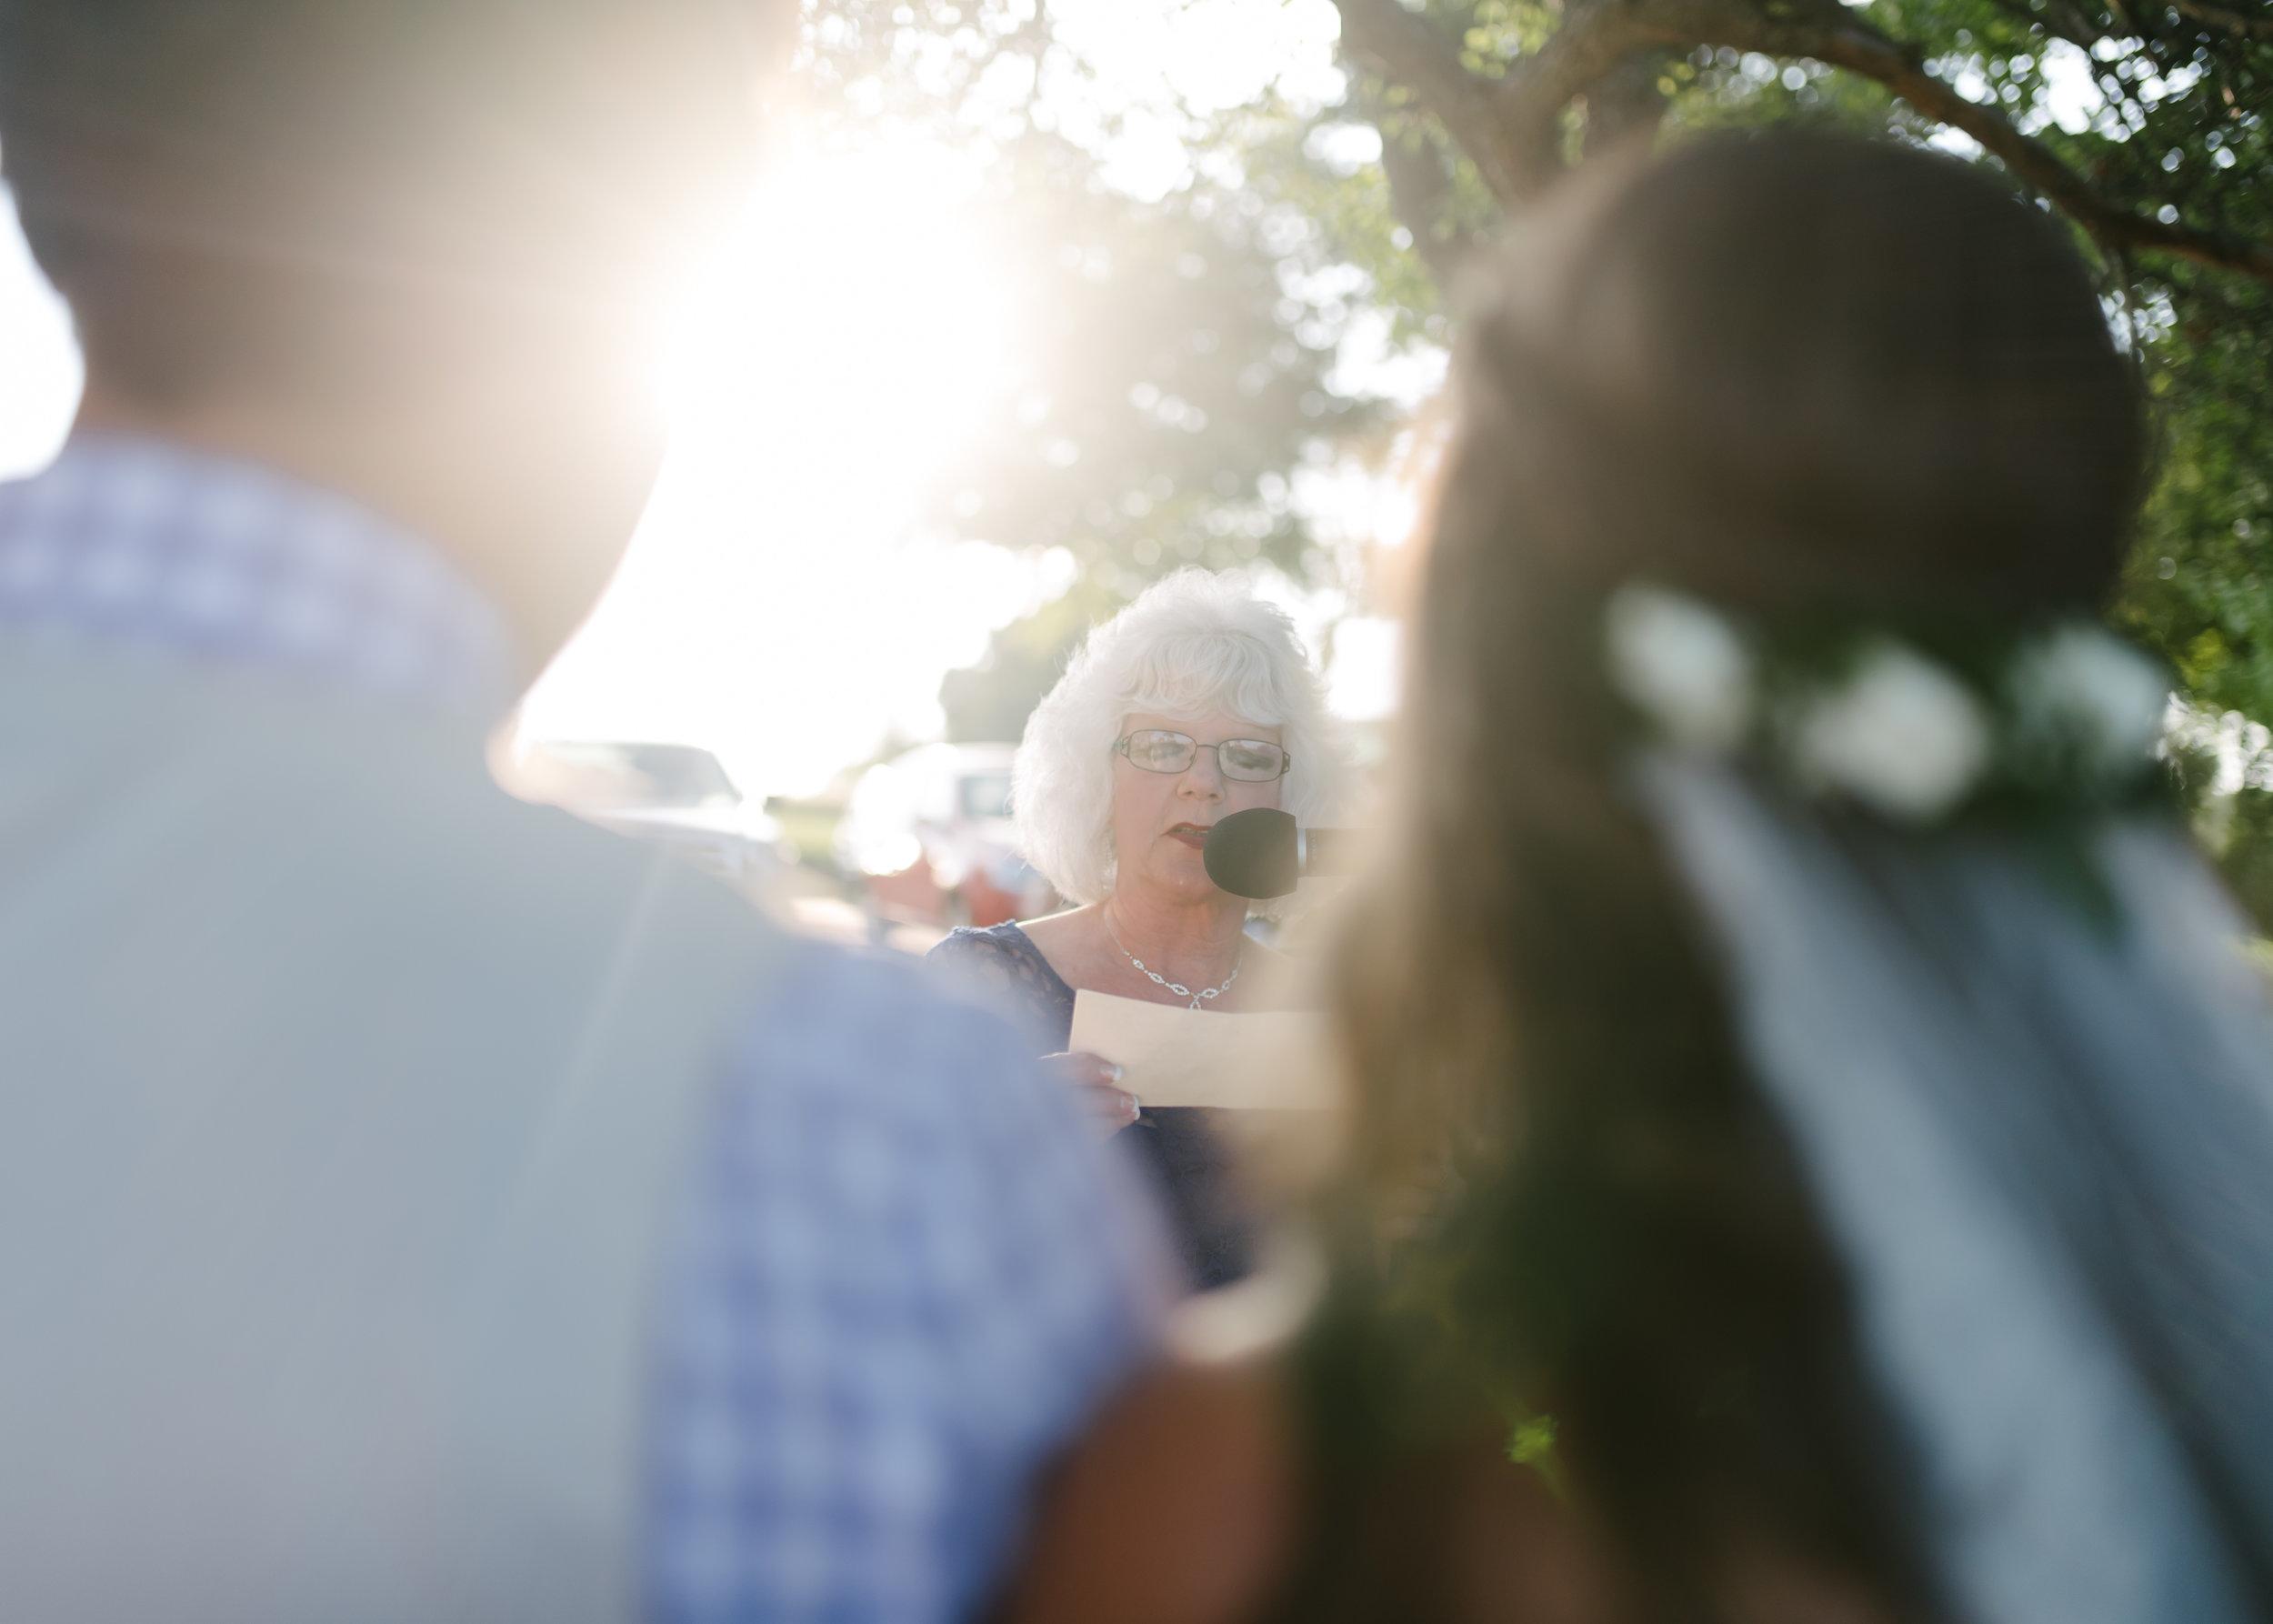 worcester-ma-wedding-photographer-4302.jpg